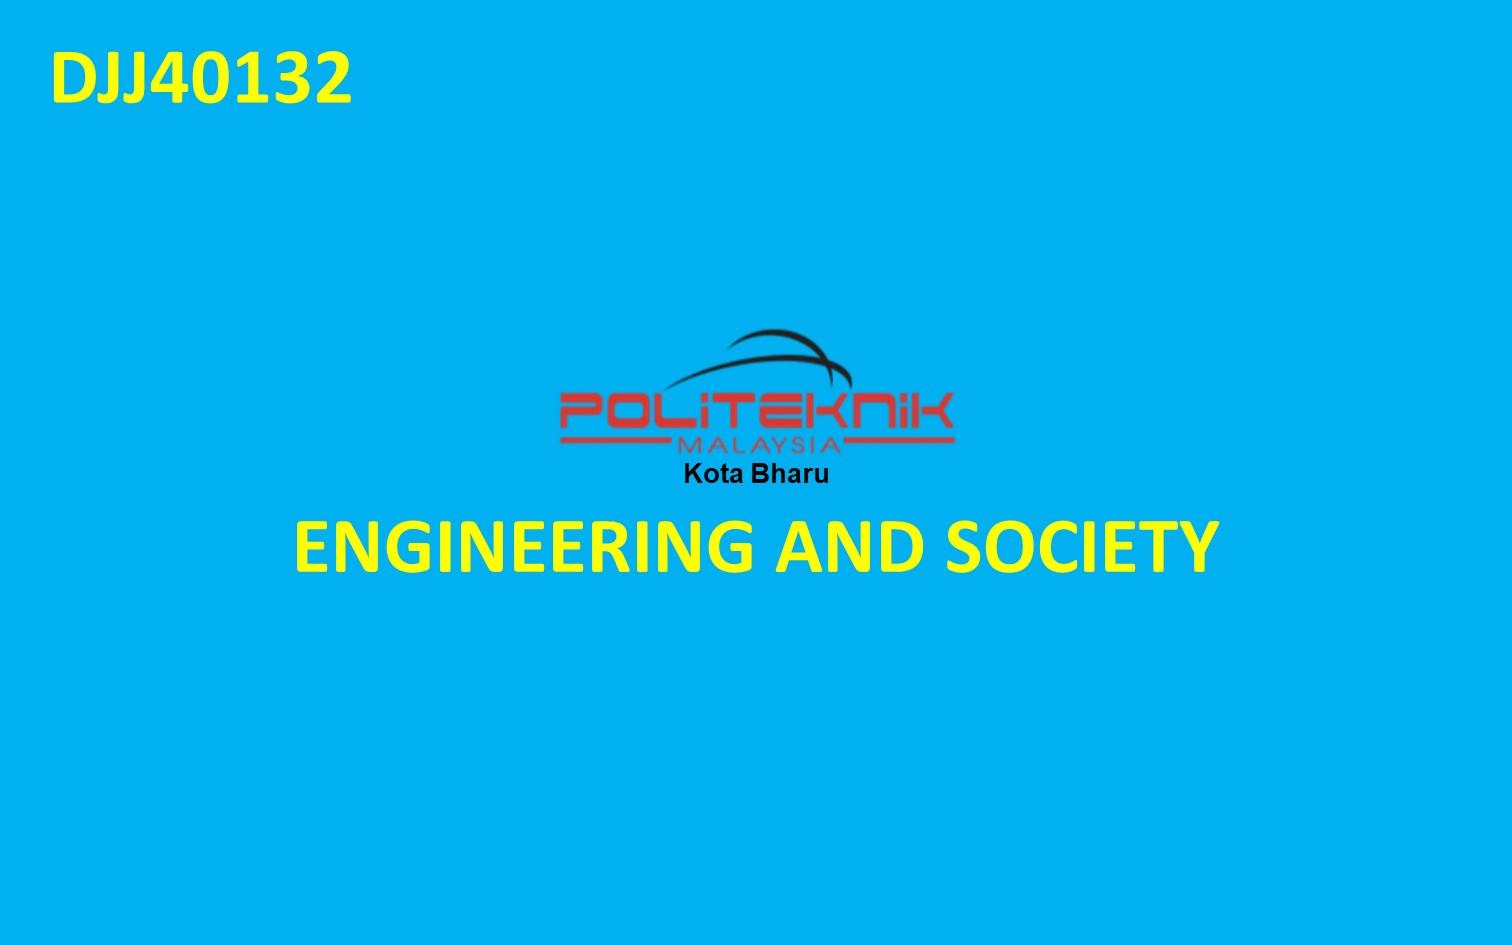 DJJ40132 ENGINEERING AND SOCIETY